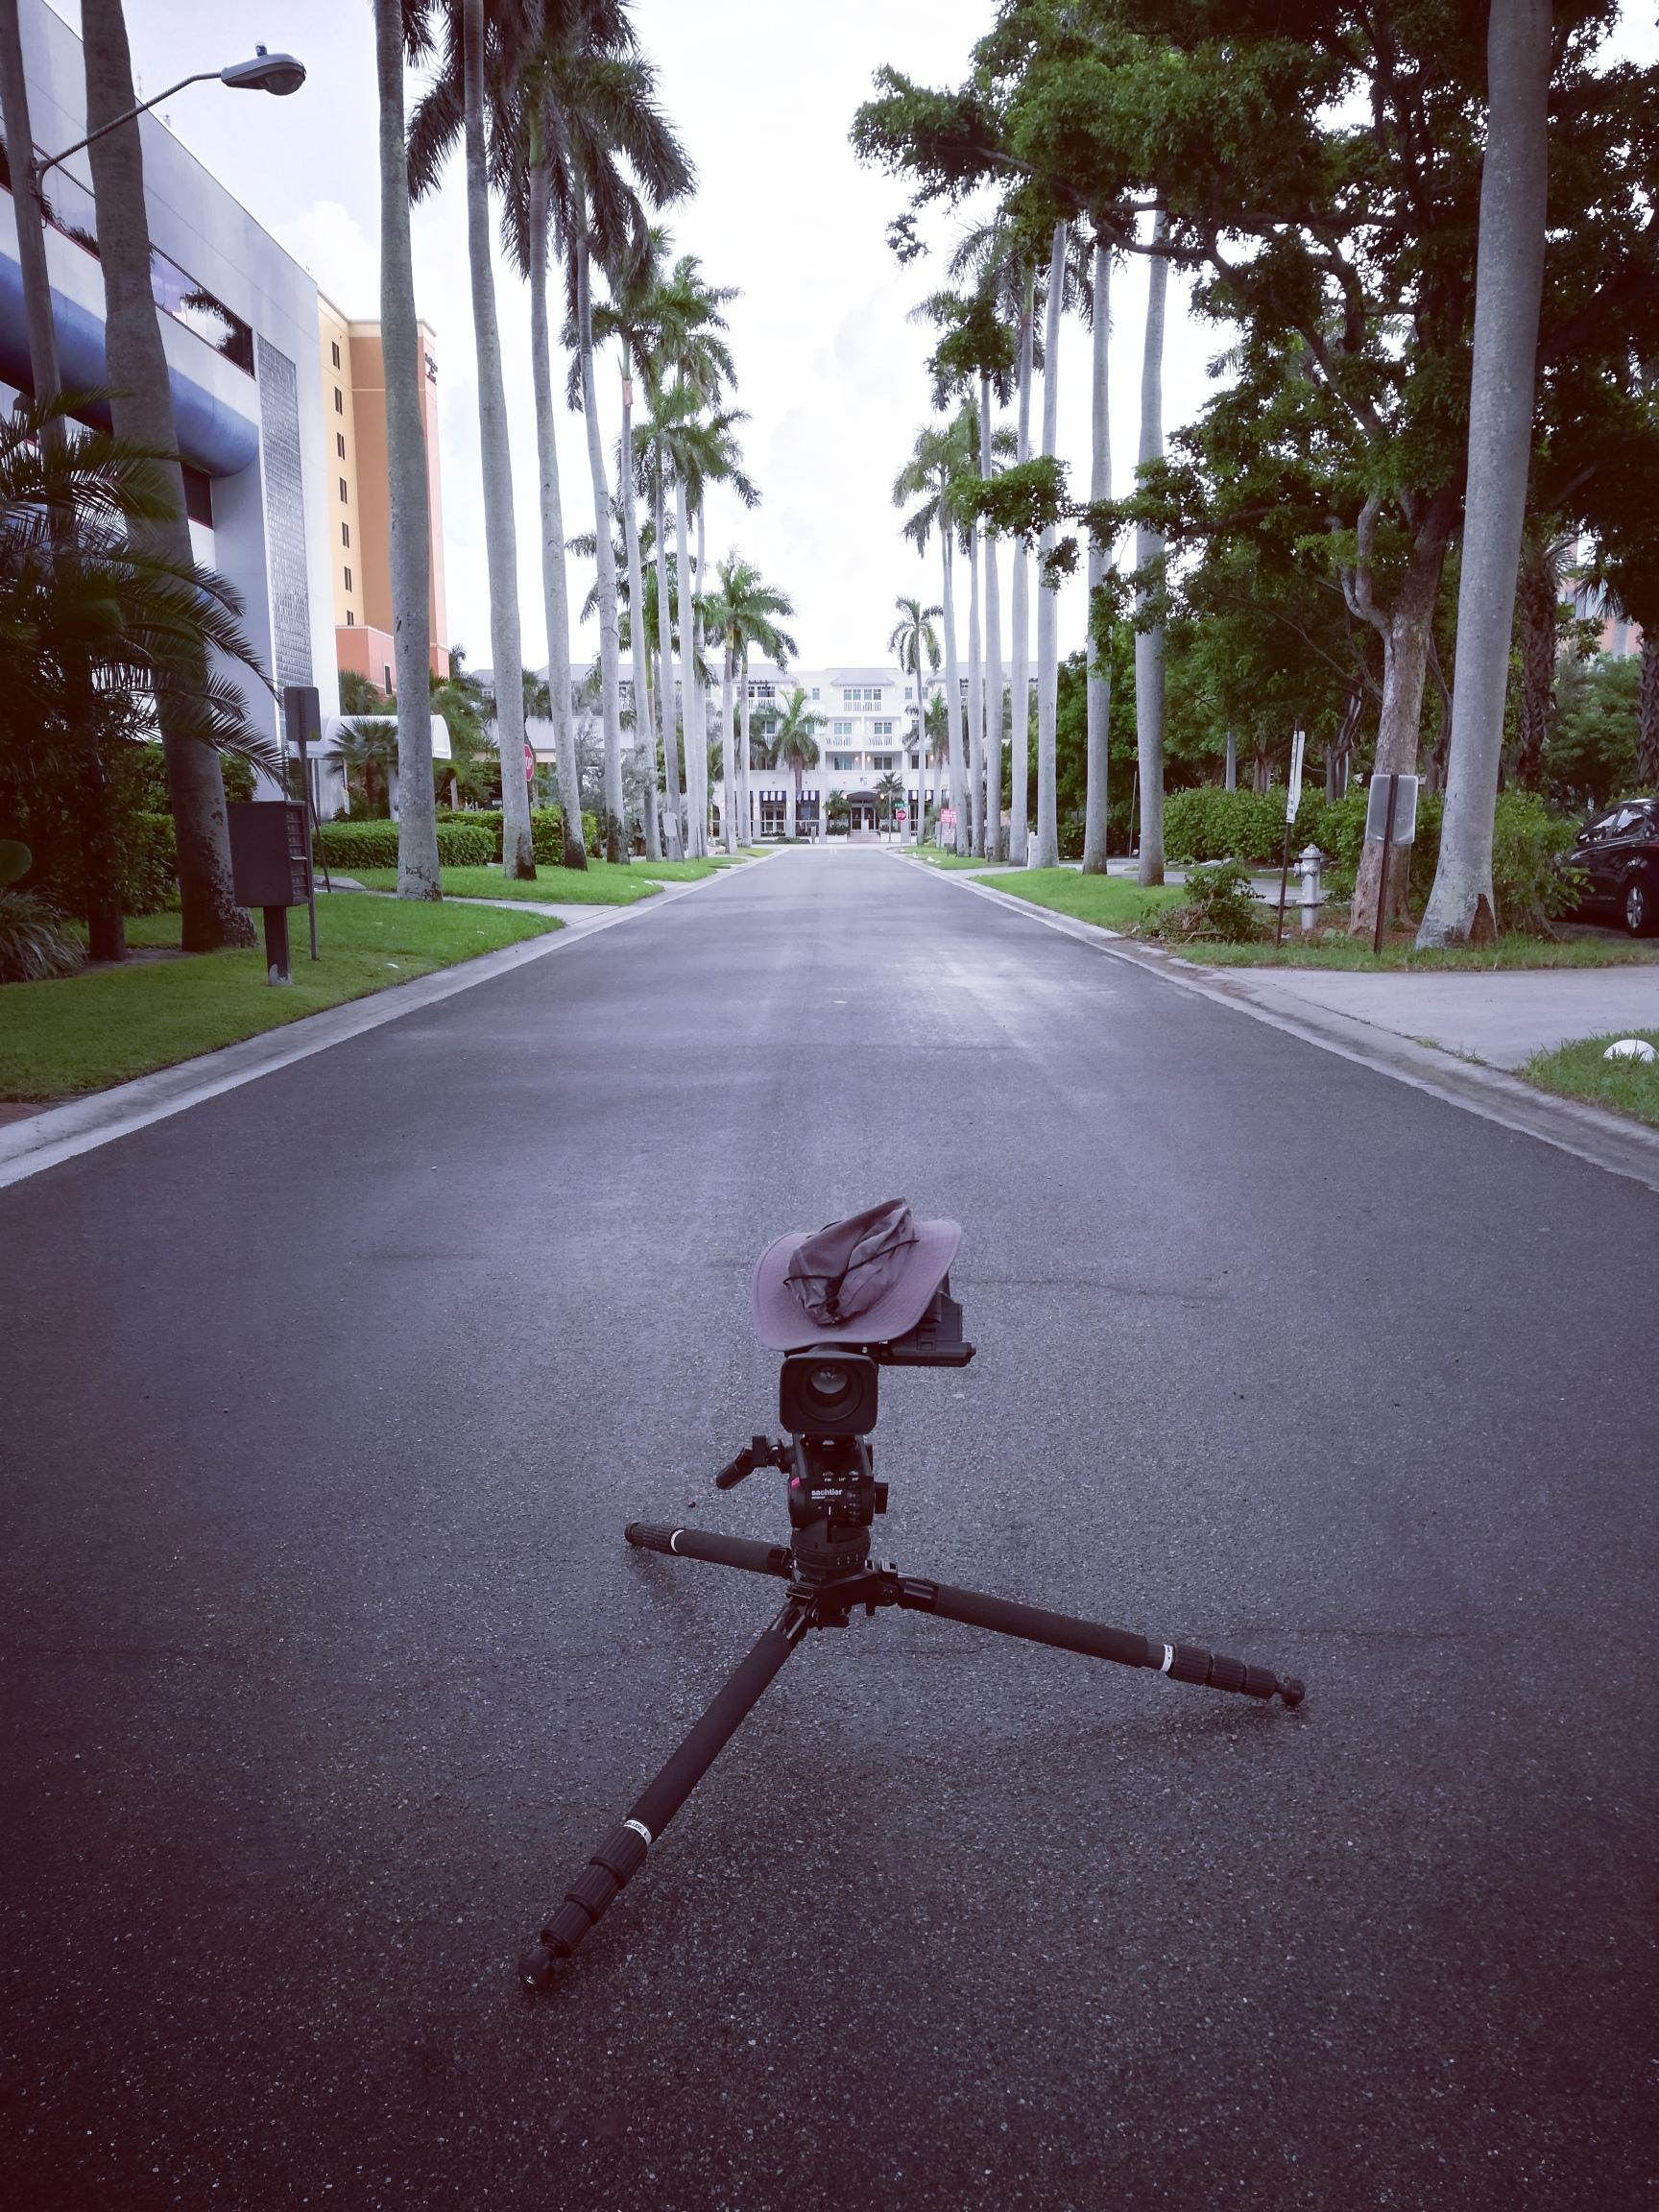 Available Packages - Red Weapon Camera PackageSony FS7 Camera PackageSony A7RIII Camera PackageOdyssey 7Q+ Monitors/RecordersFollow Focus Kit (Teradek Bolt 3000, Bartech)DJI Ronin ClassicDJI Ronin SDJI Mavic Pro18.5